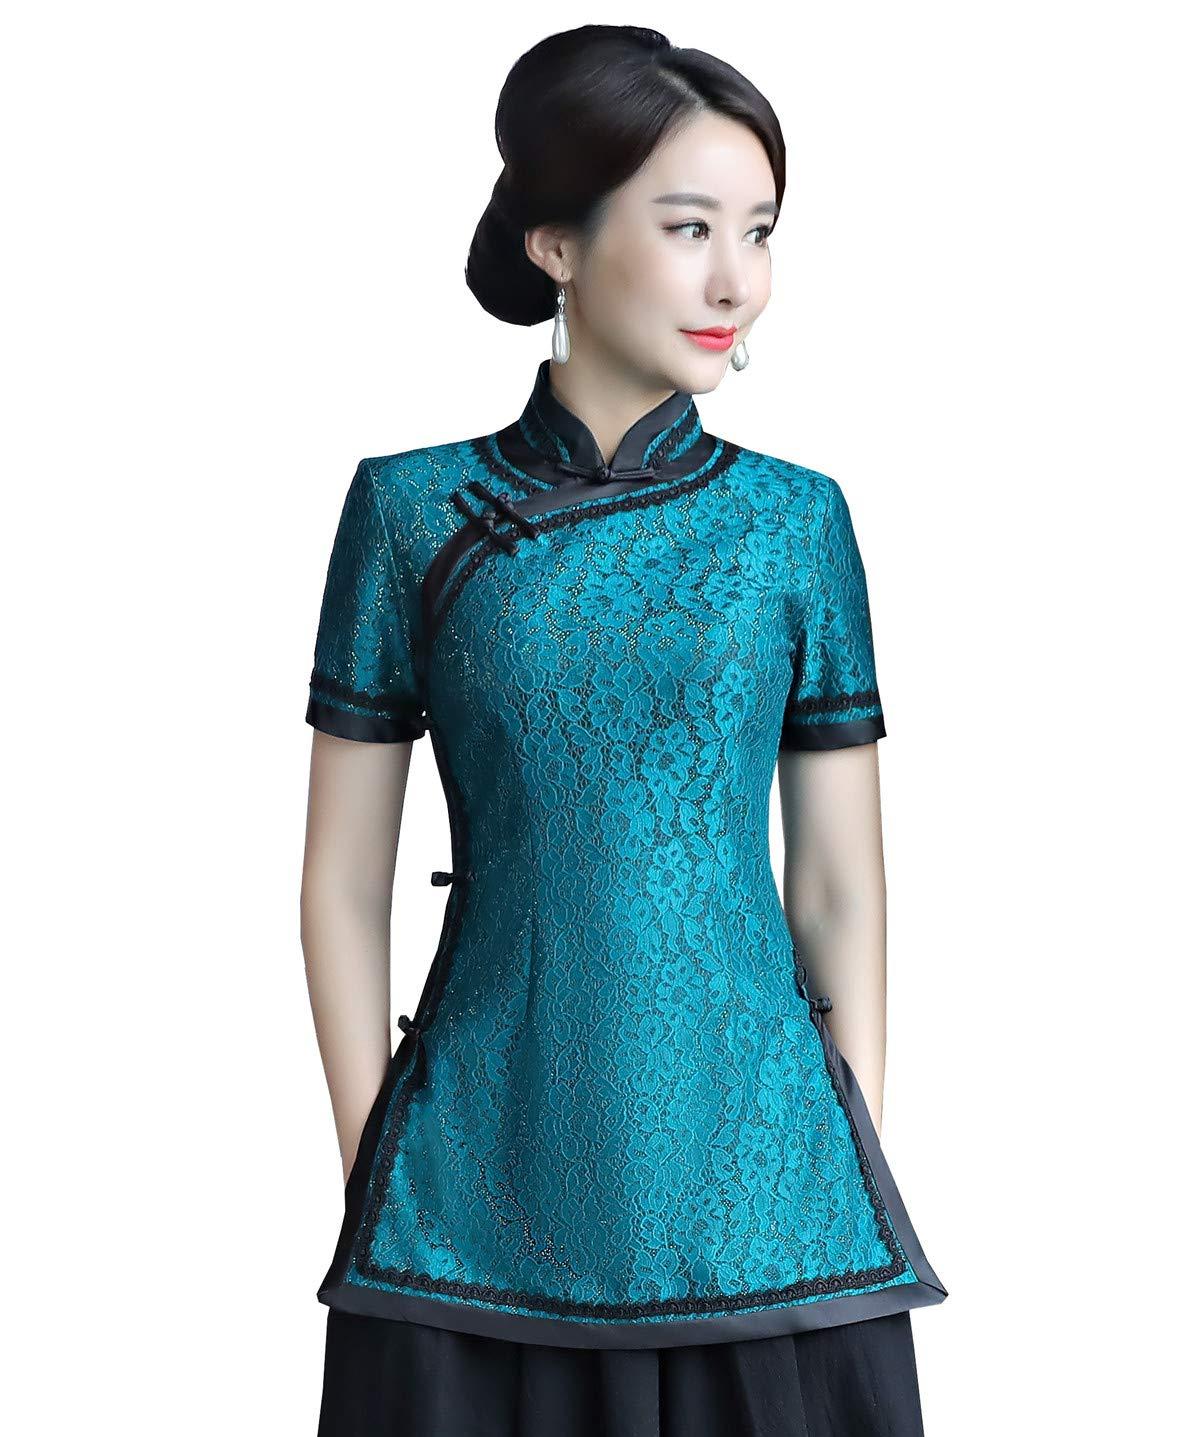 Shanghai Story Lace Short Sleeve Cheongsam Top China Qipao Shirt Chinese Blouse with Black Linen Skirt